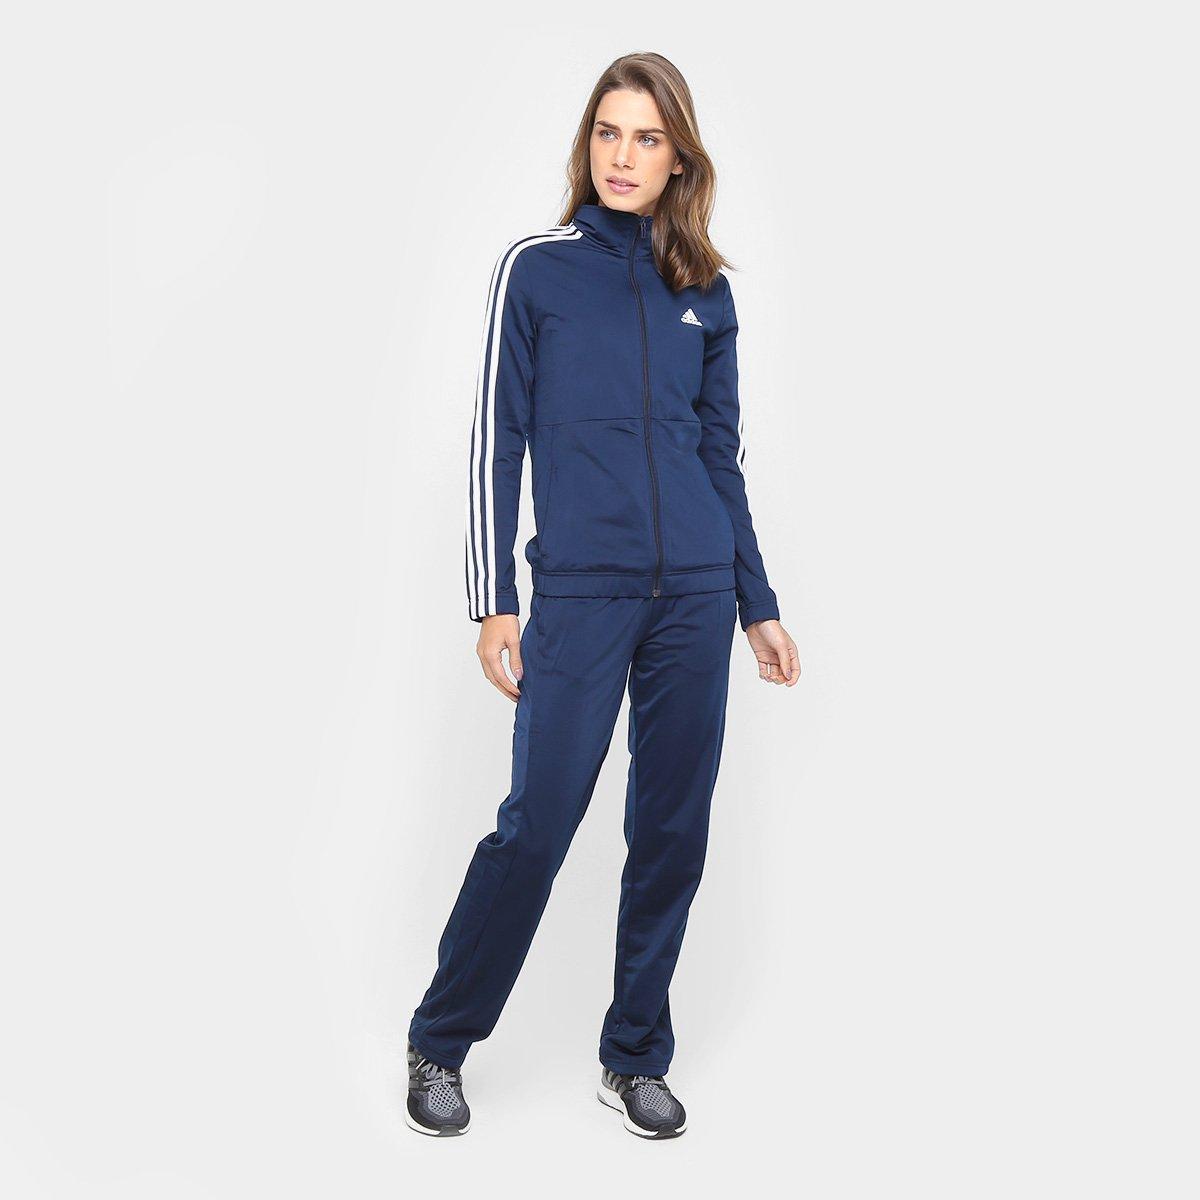 d8bbea42e6 Agasalho Adidas Back 2 Basic 3S Feminino